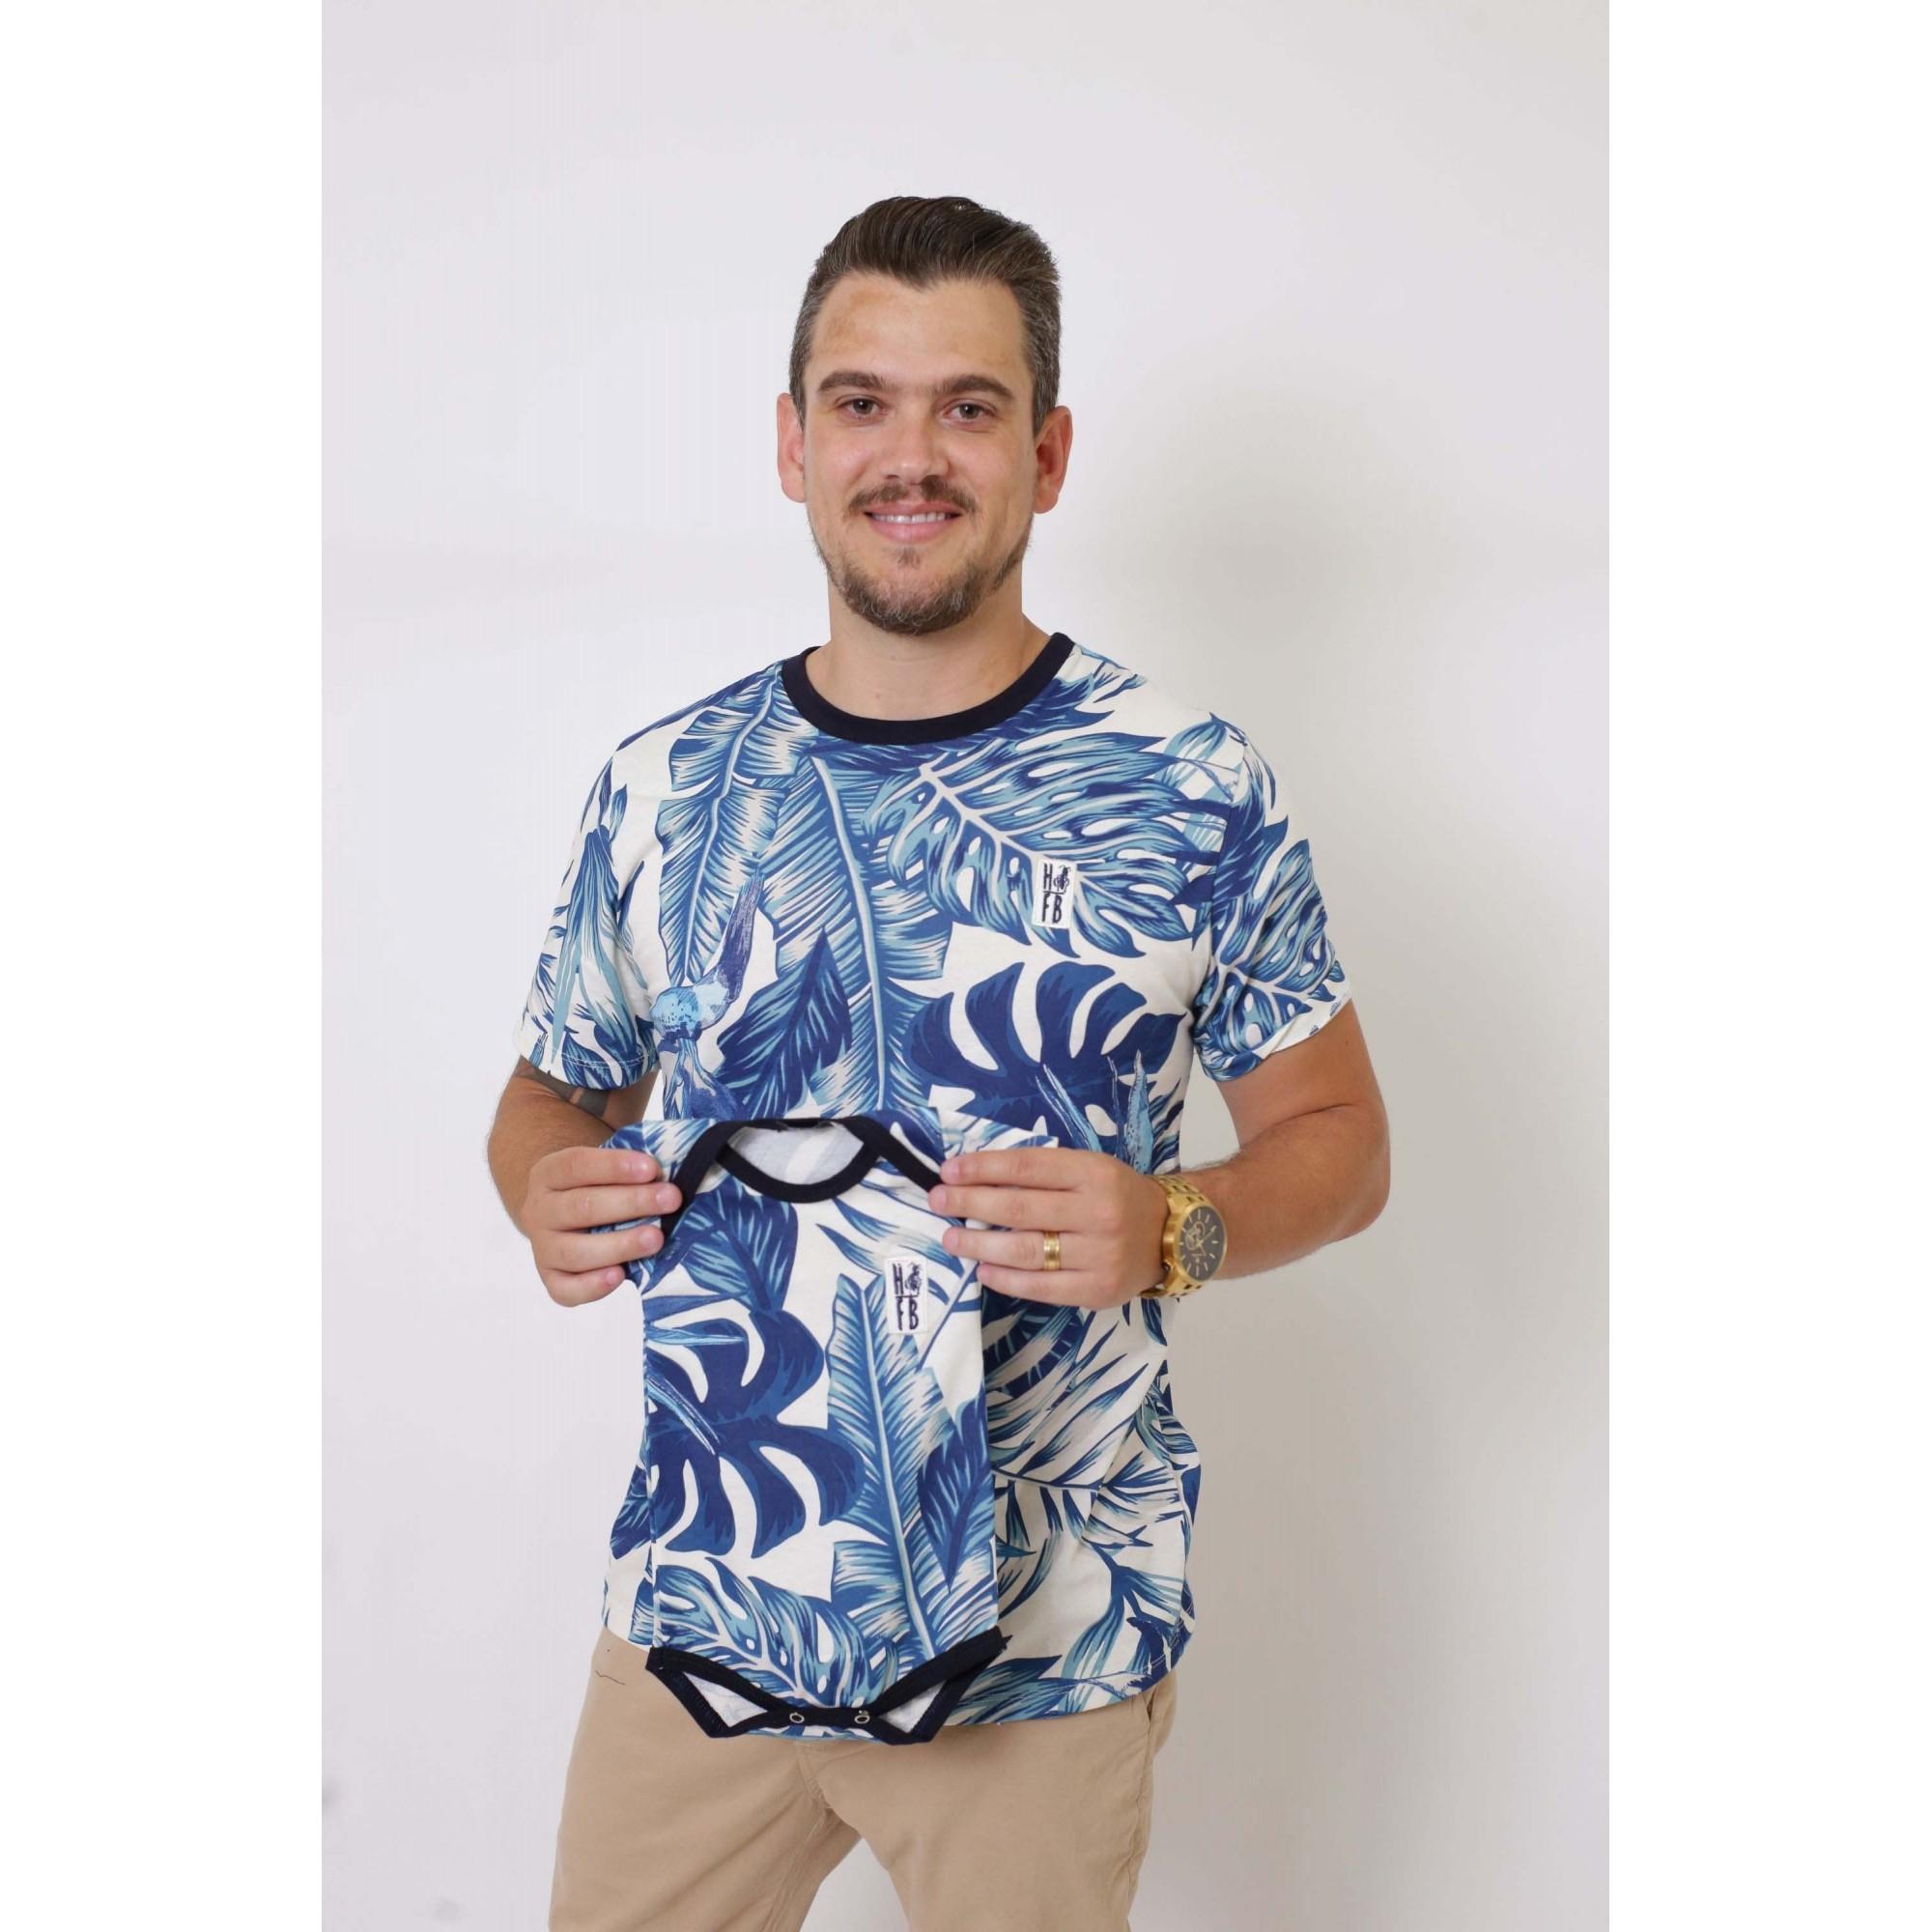 PAI E FILHA > 02 T-Shirts - Caribe  [Coleção Tal Pai Tal Filha]  - Heitor Fashion Brazil